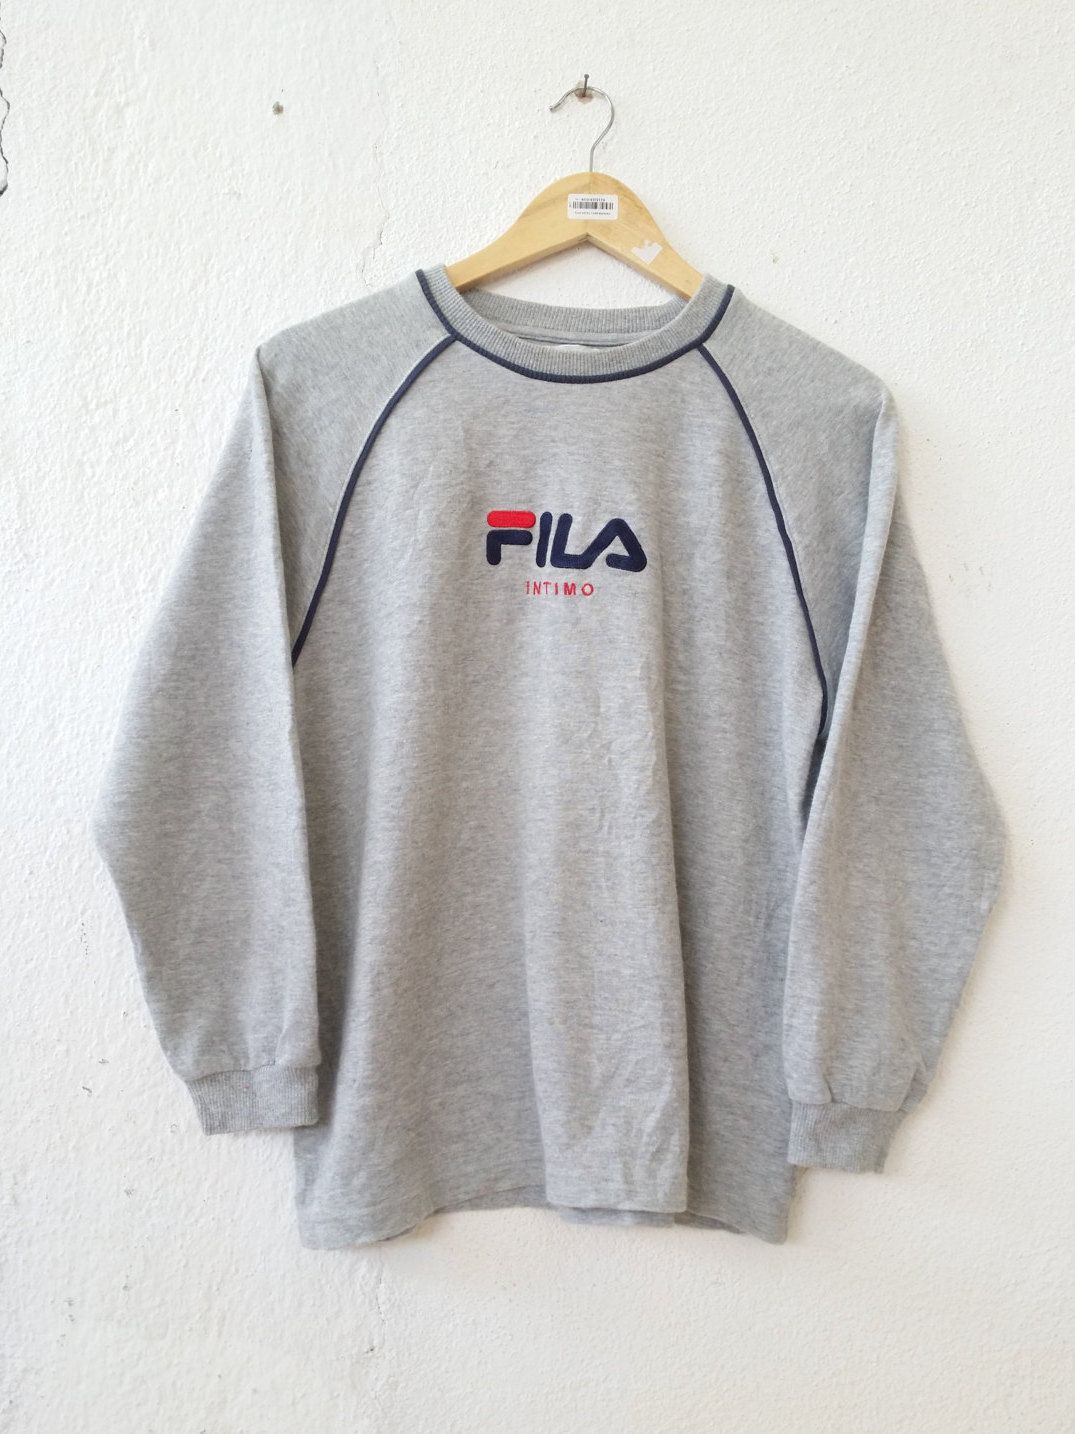 90's FILA Spell-Out Sweatshirt - Heather Grey kFjyps8